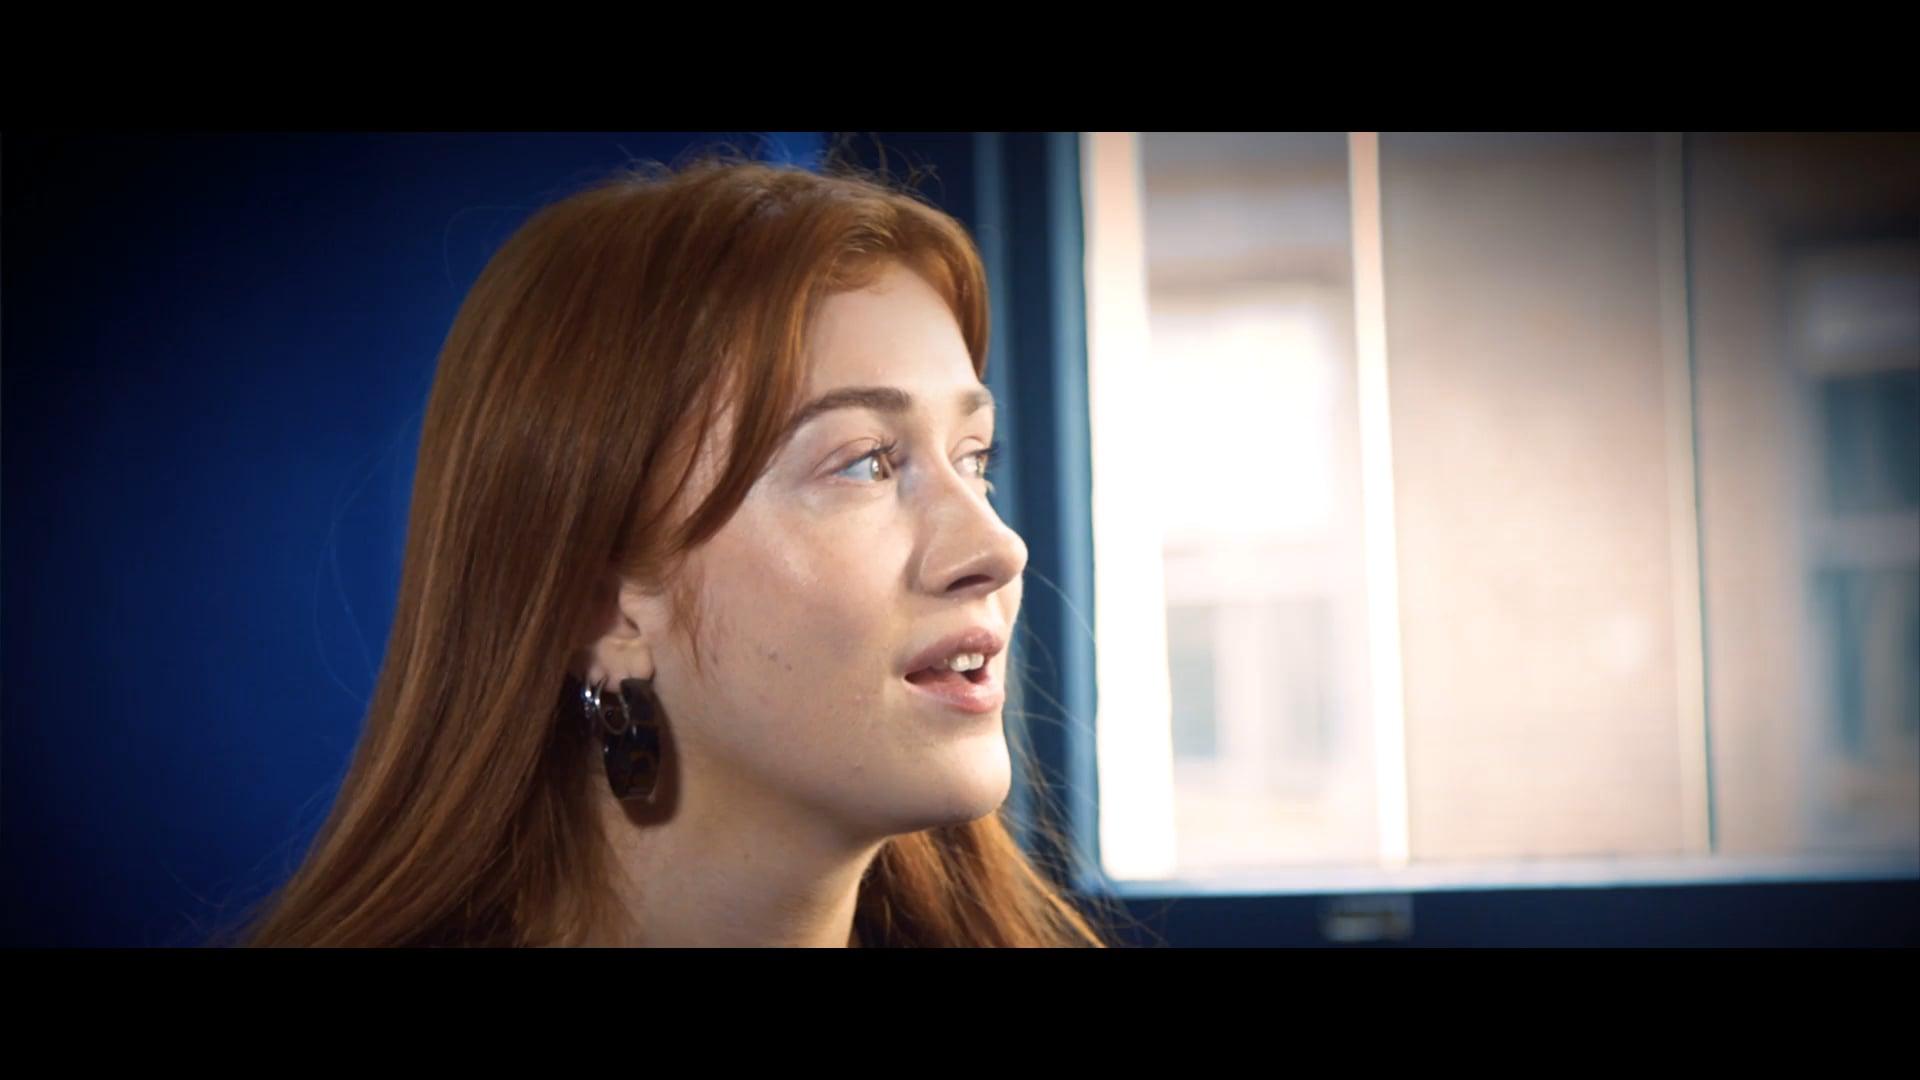 Lara Cooper Chadwick - Actor